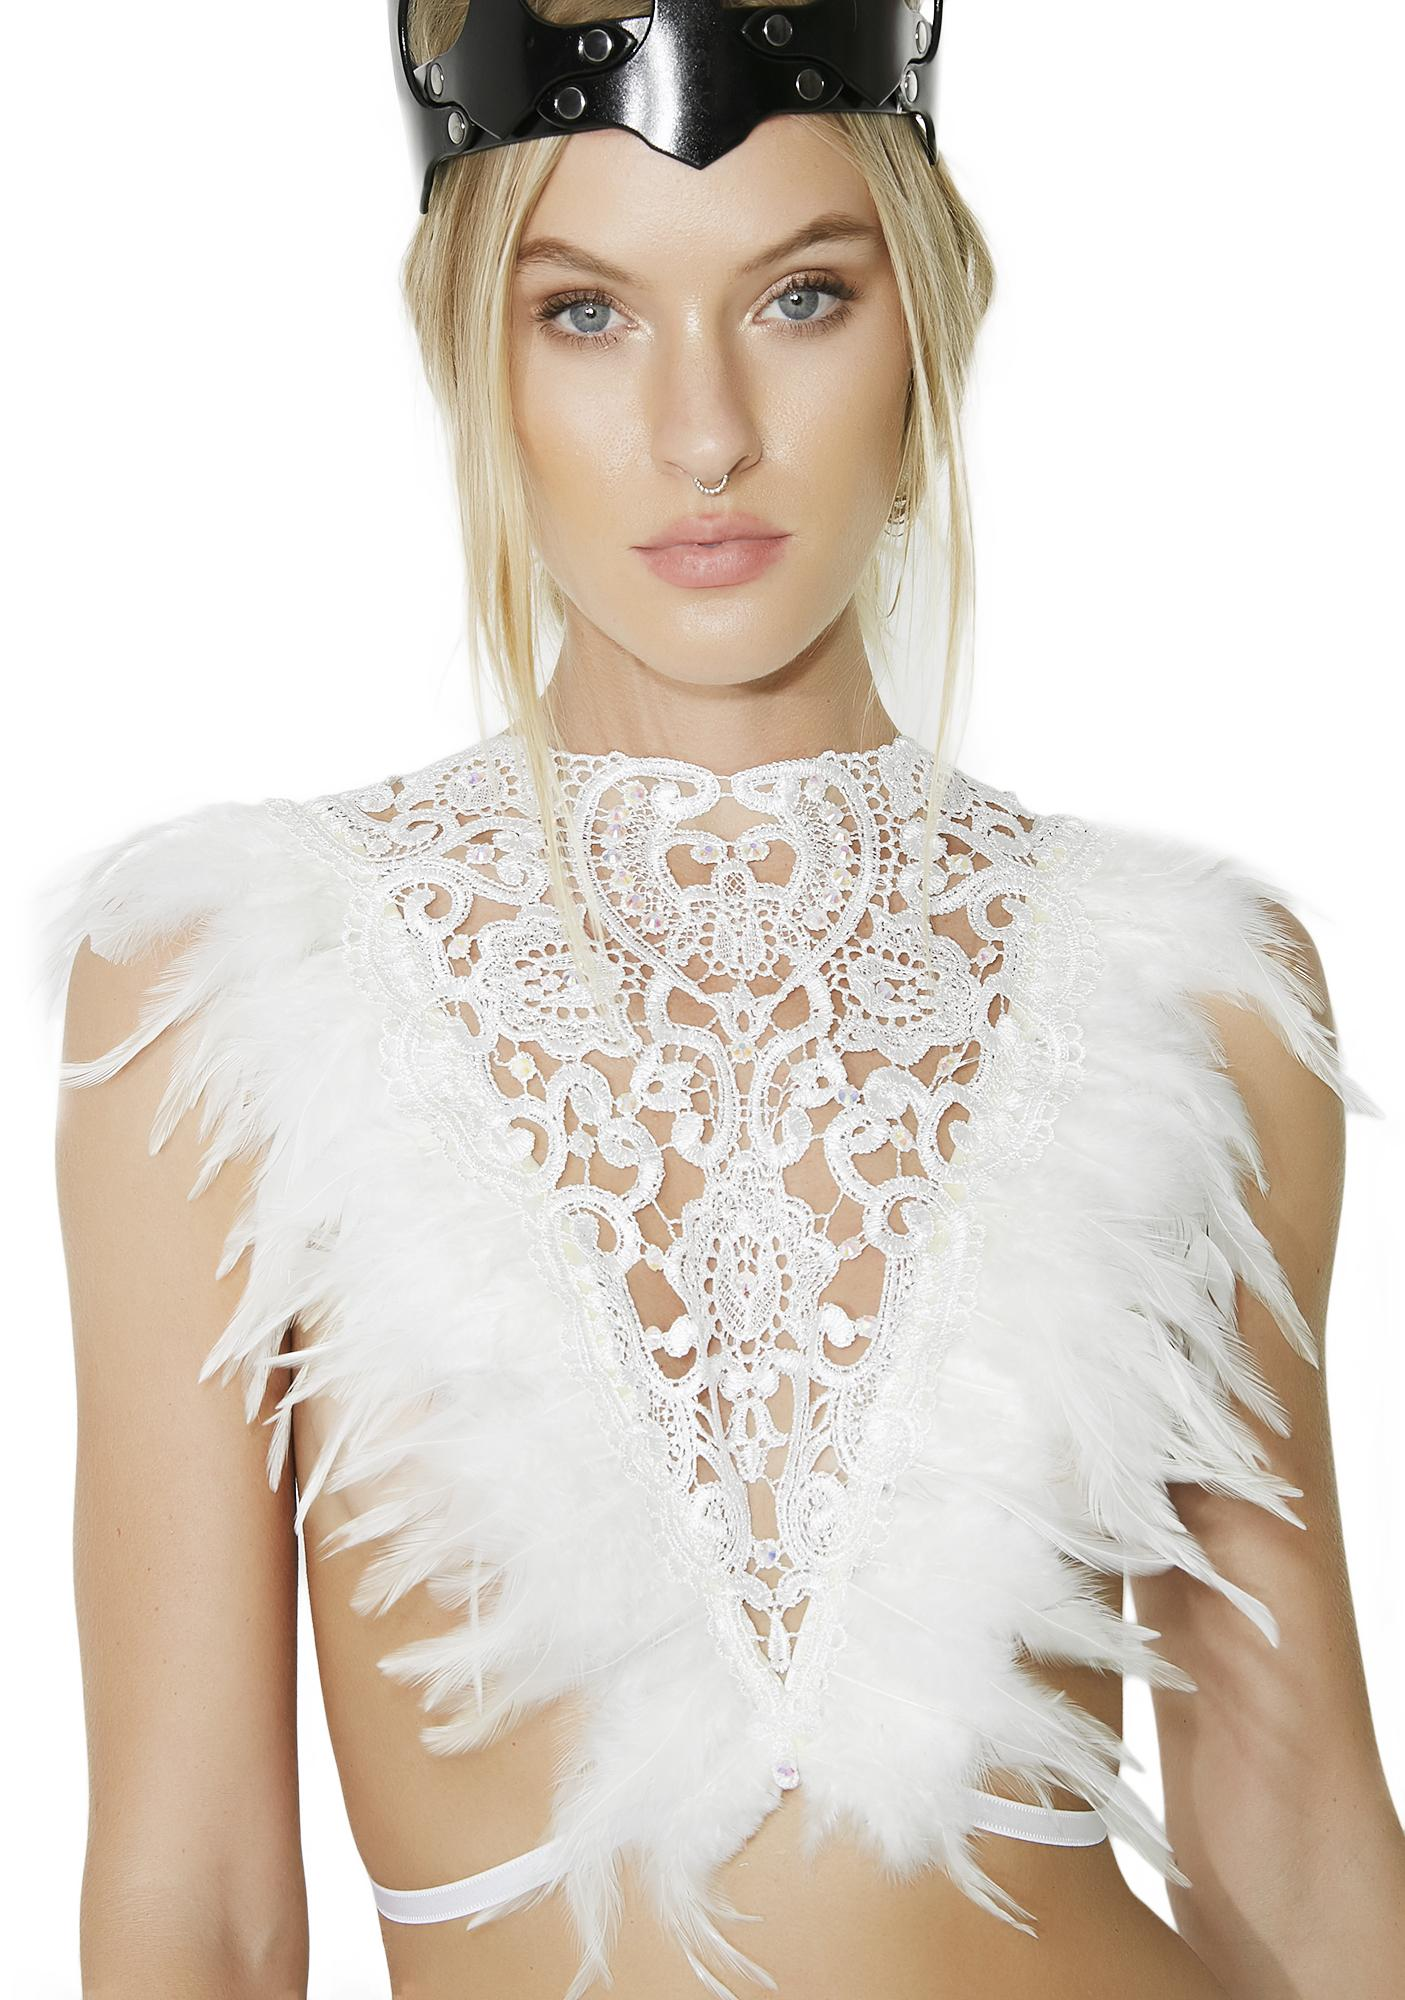 Love Khaos Gypsy Lace Top